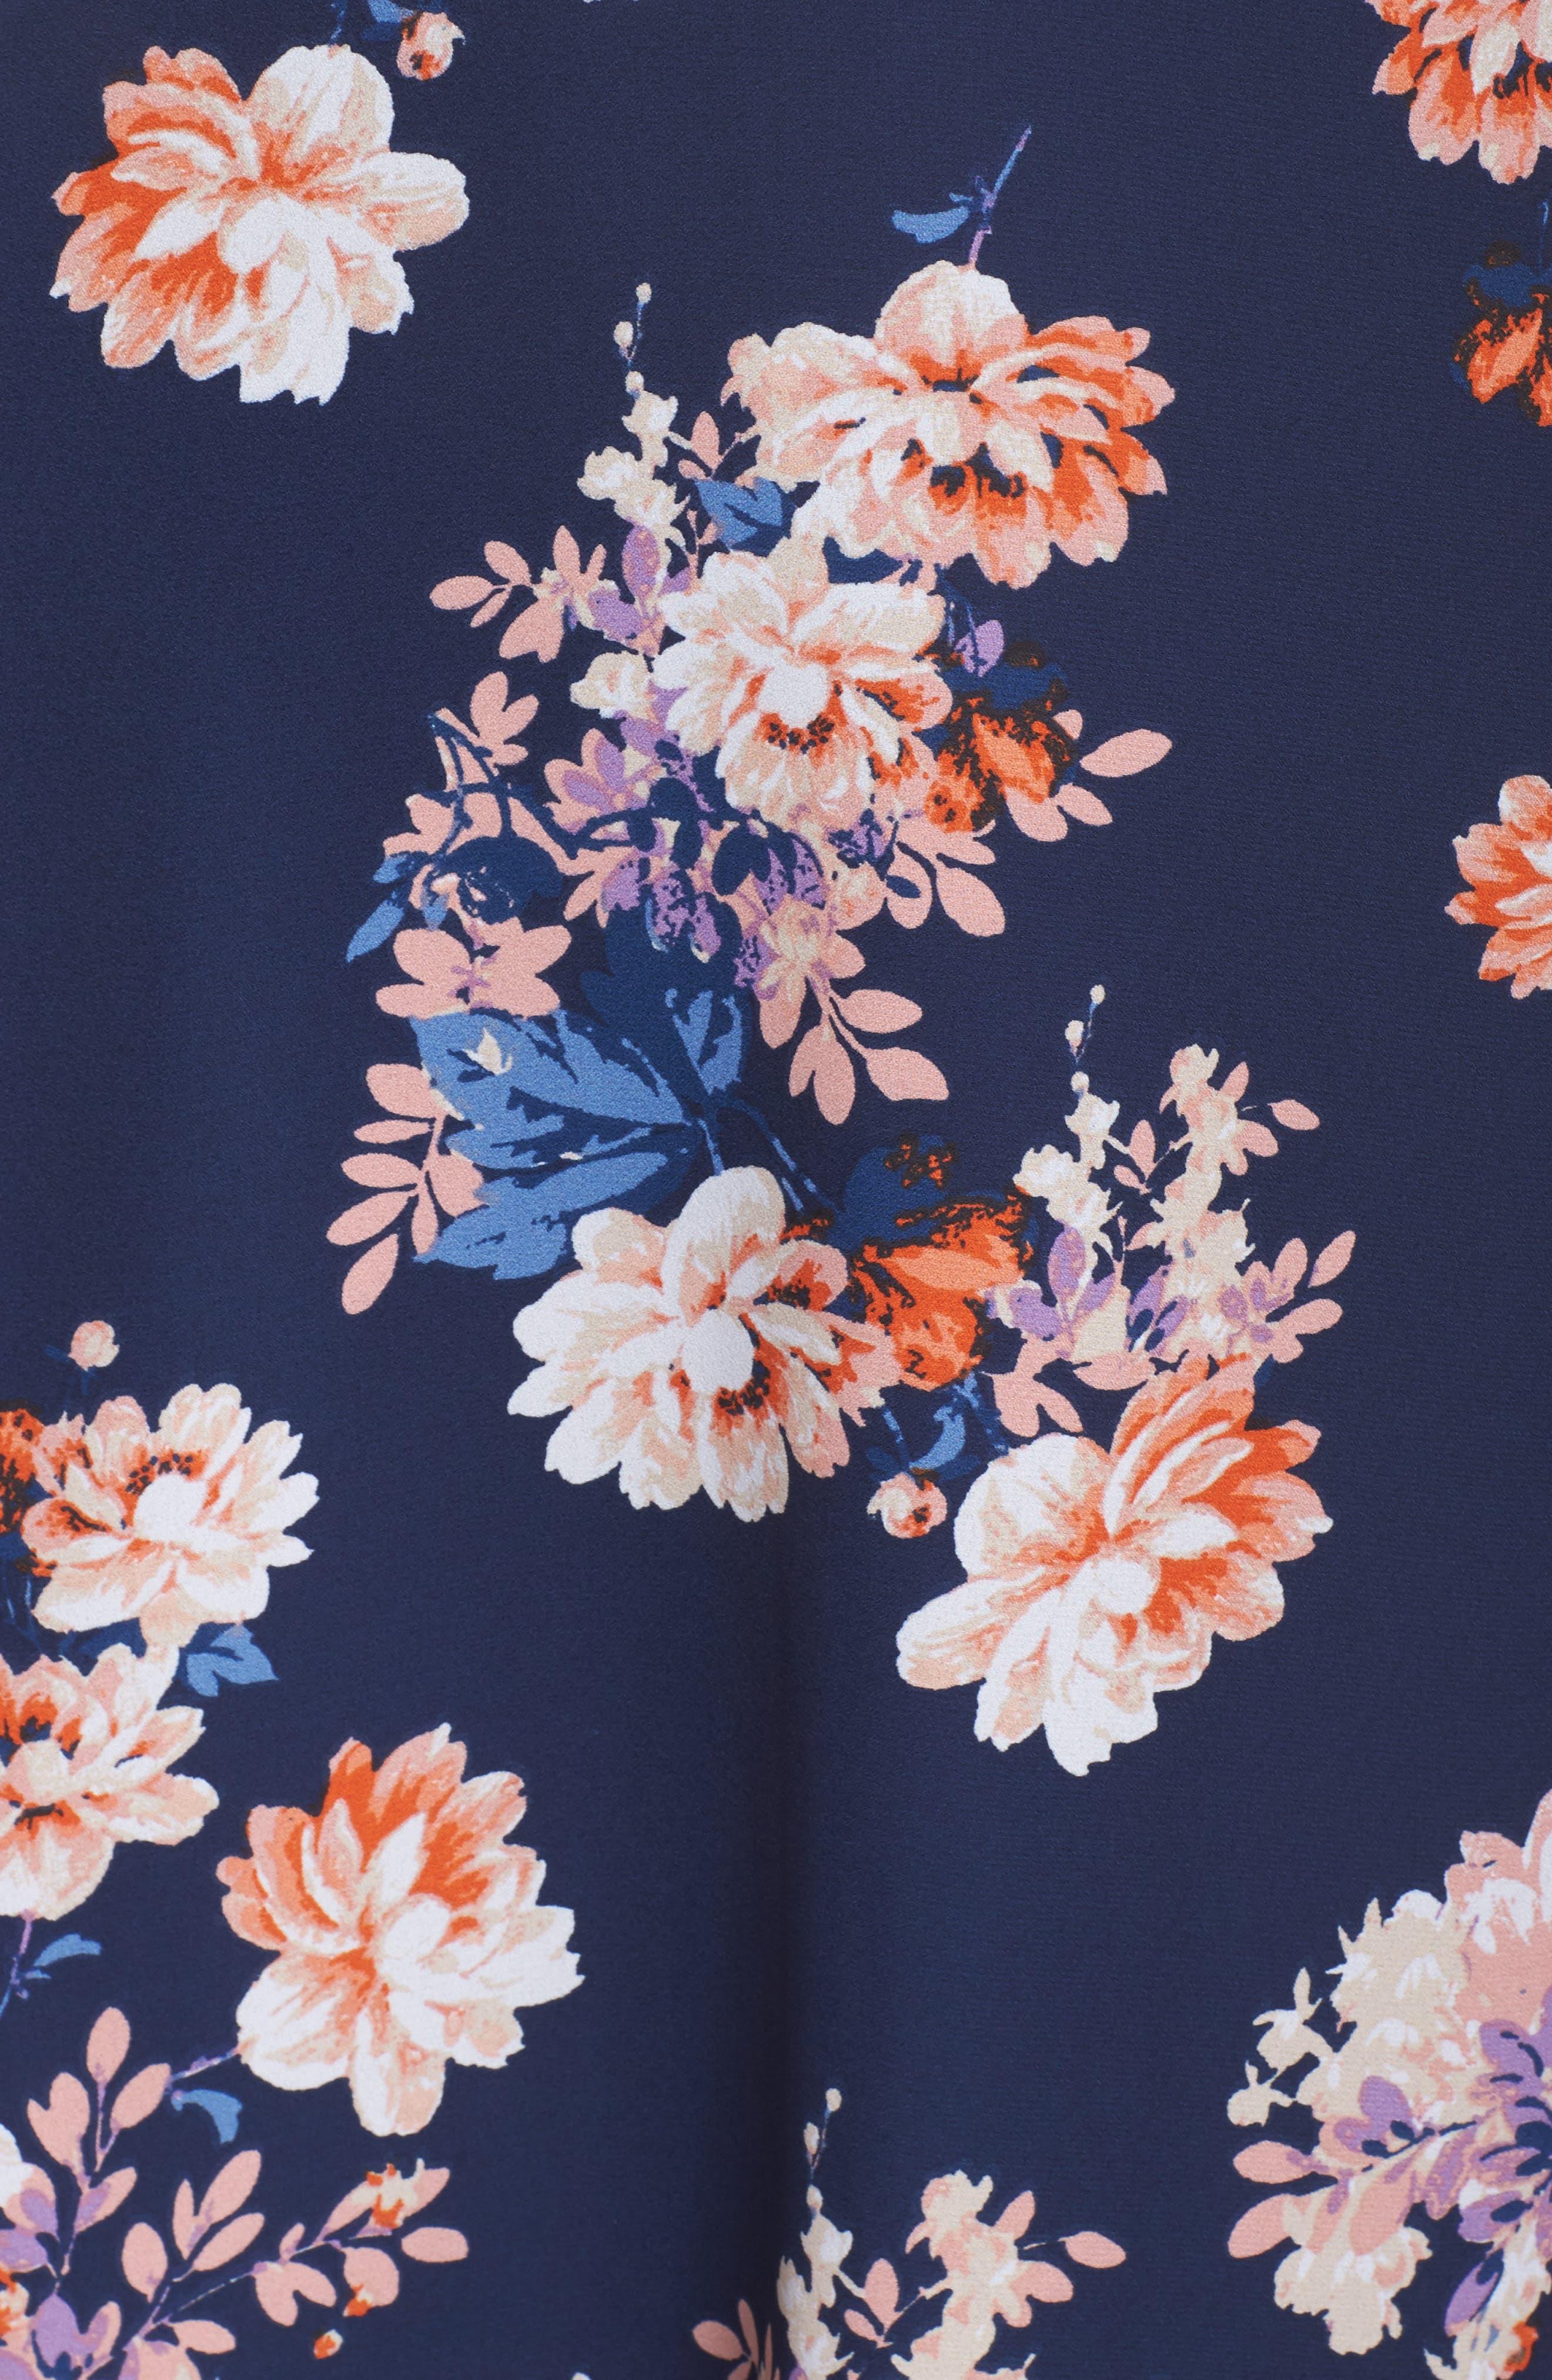 Chasing Butterflies Maxi Dress,                             Alternate thumbnail 5, color,                             400